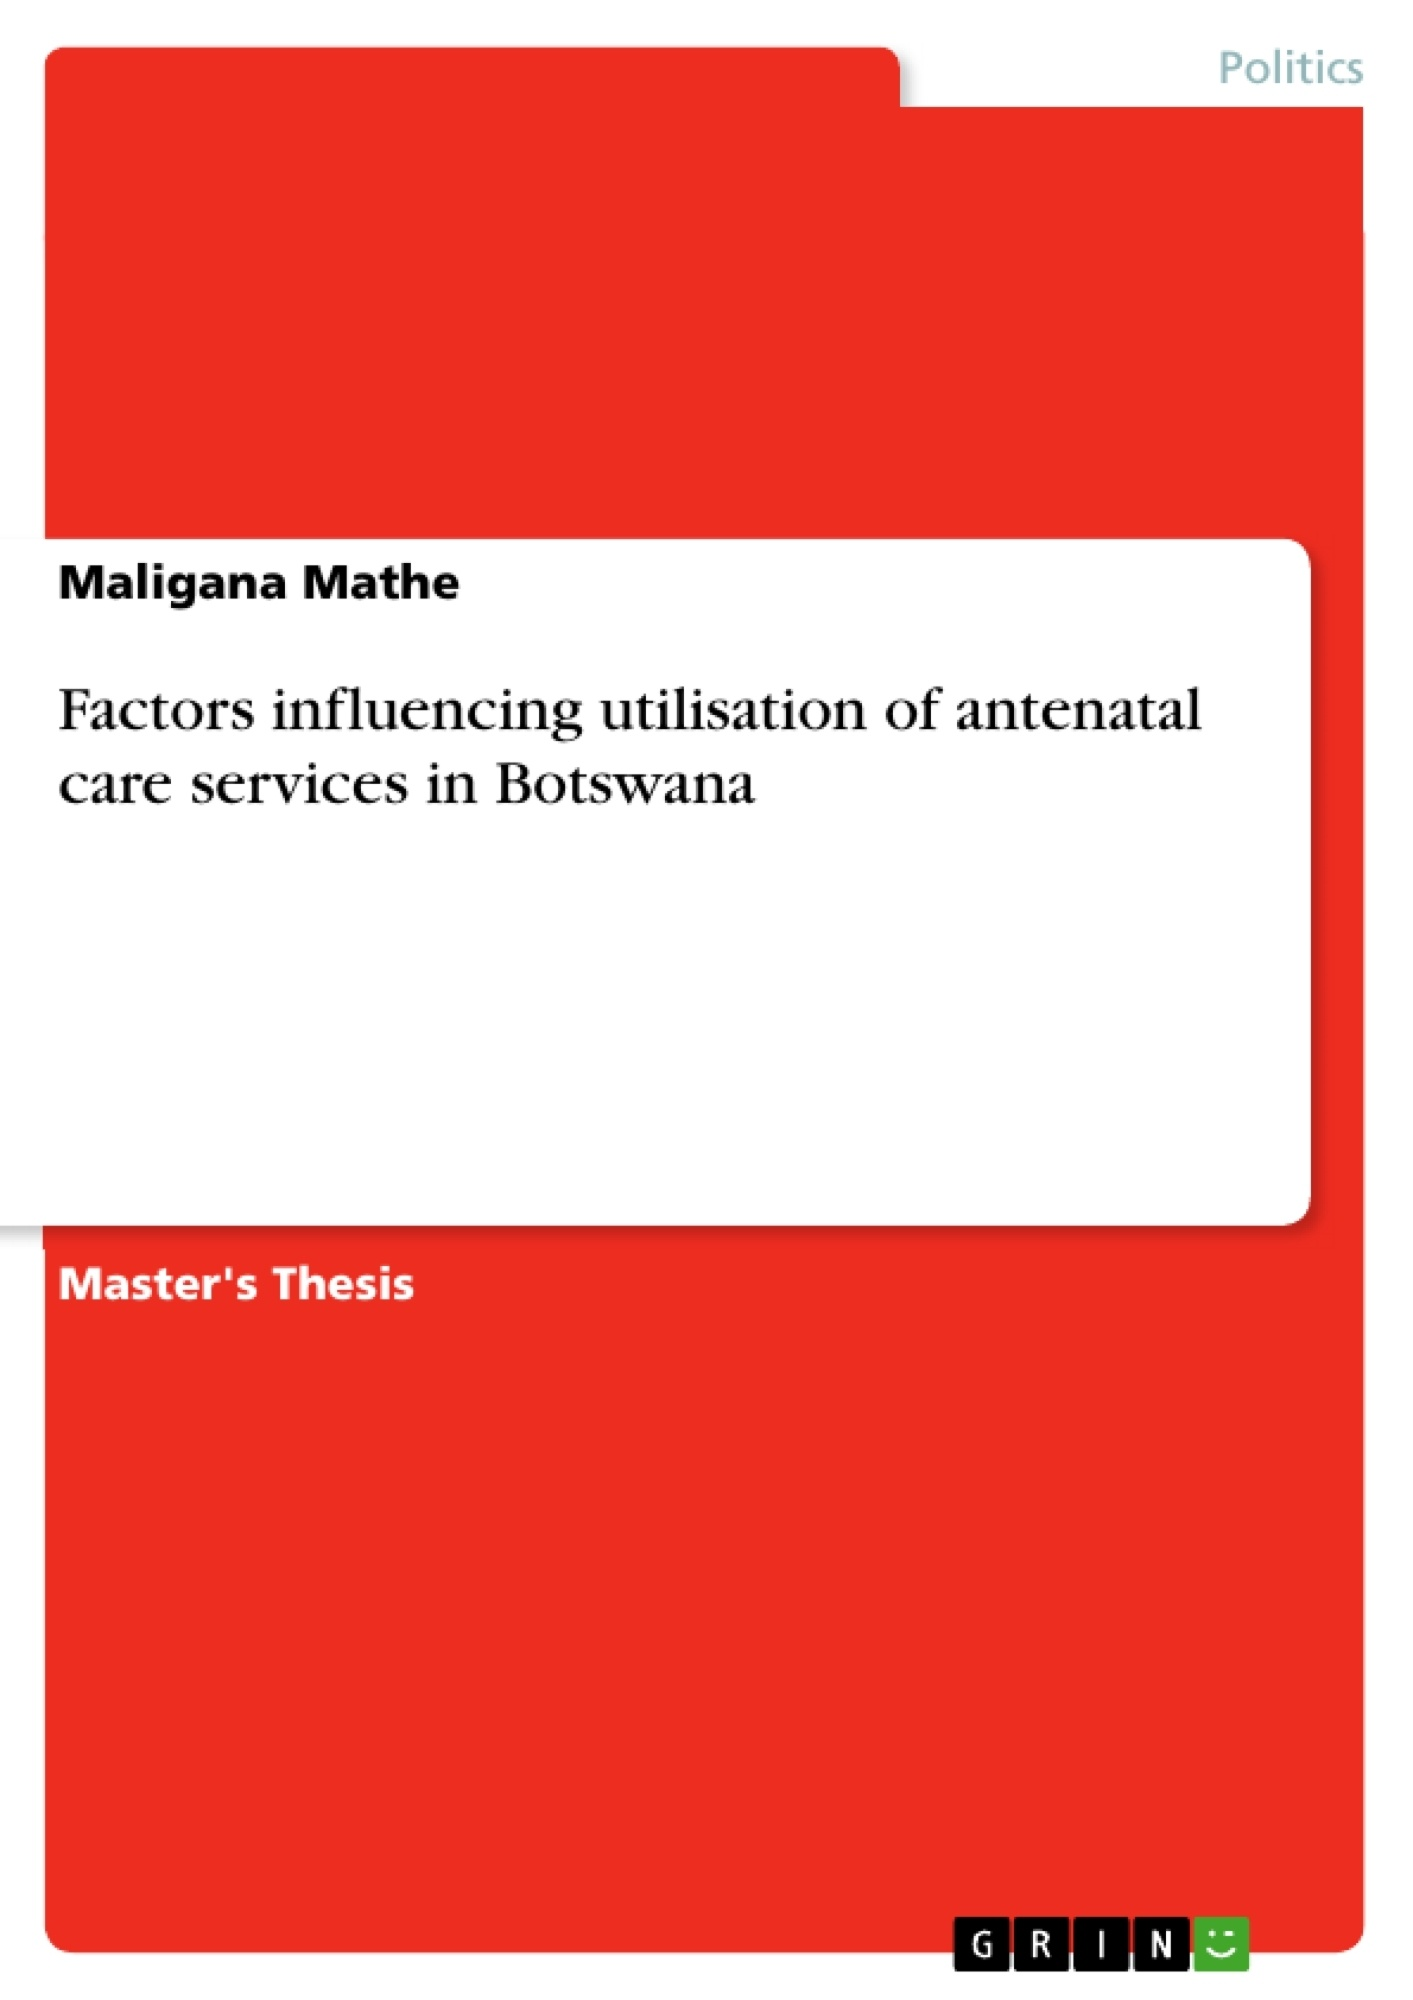 Title: Factors influencing utilisation of antenatal care services in Botswana